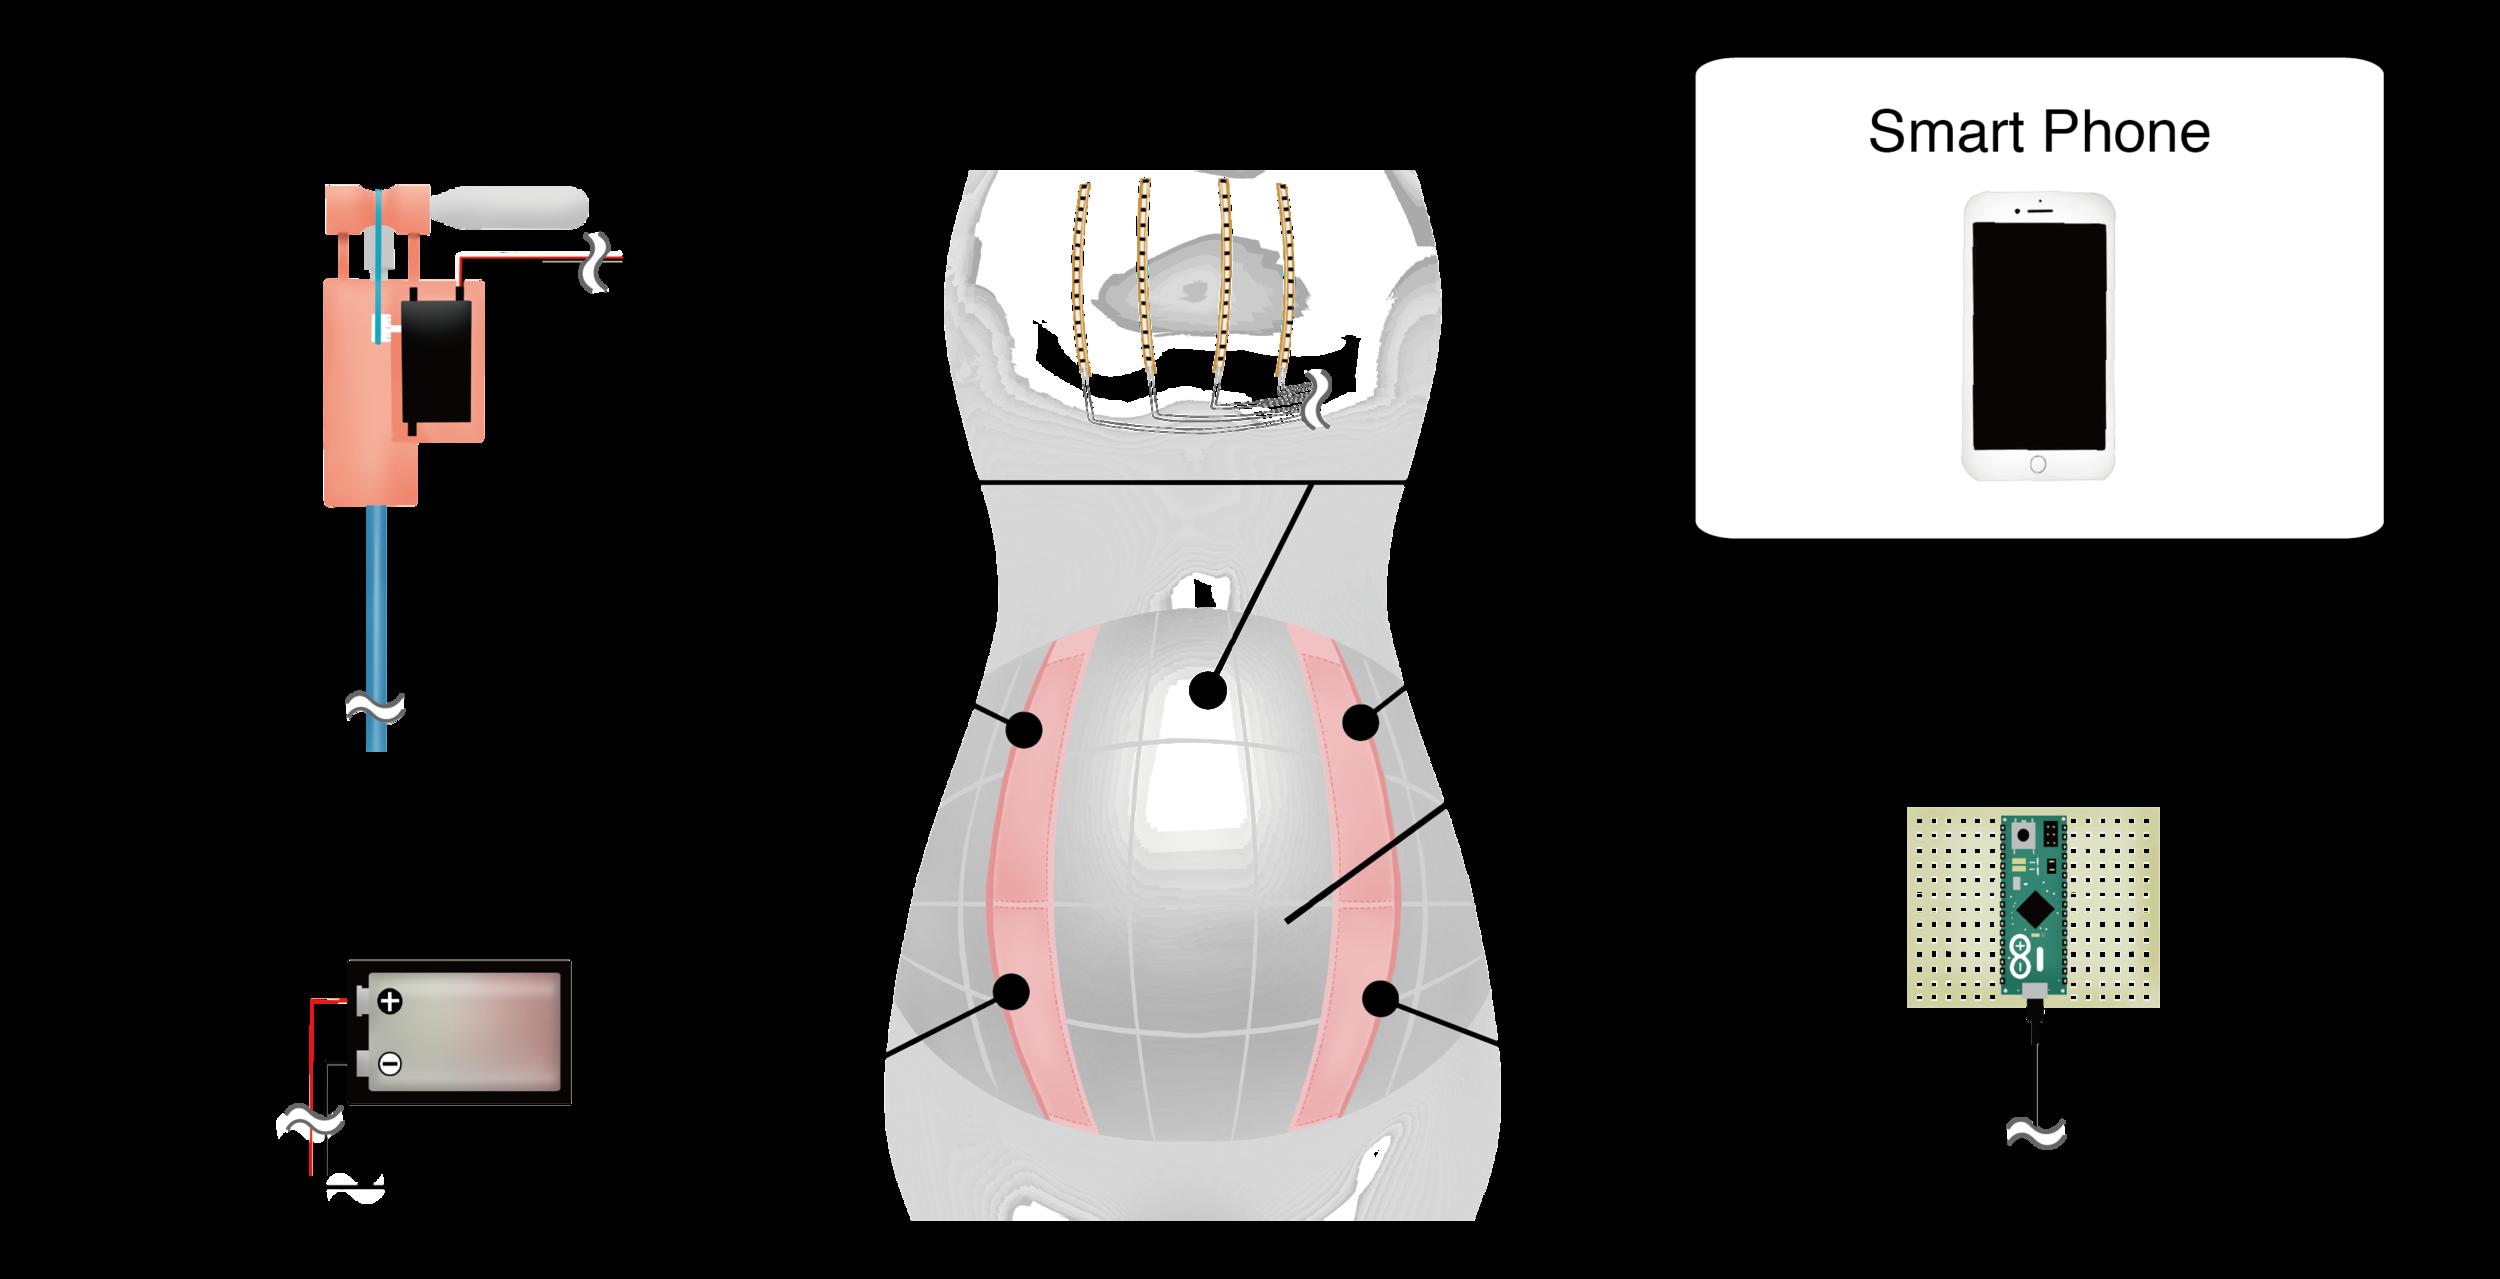 conceptVisual